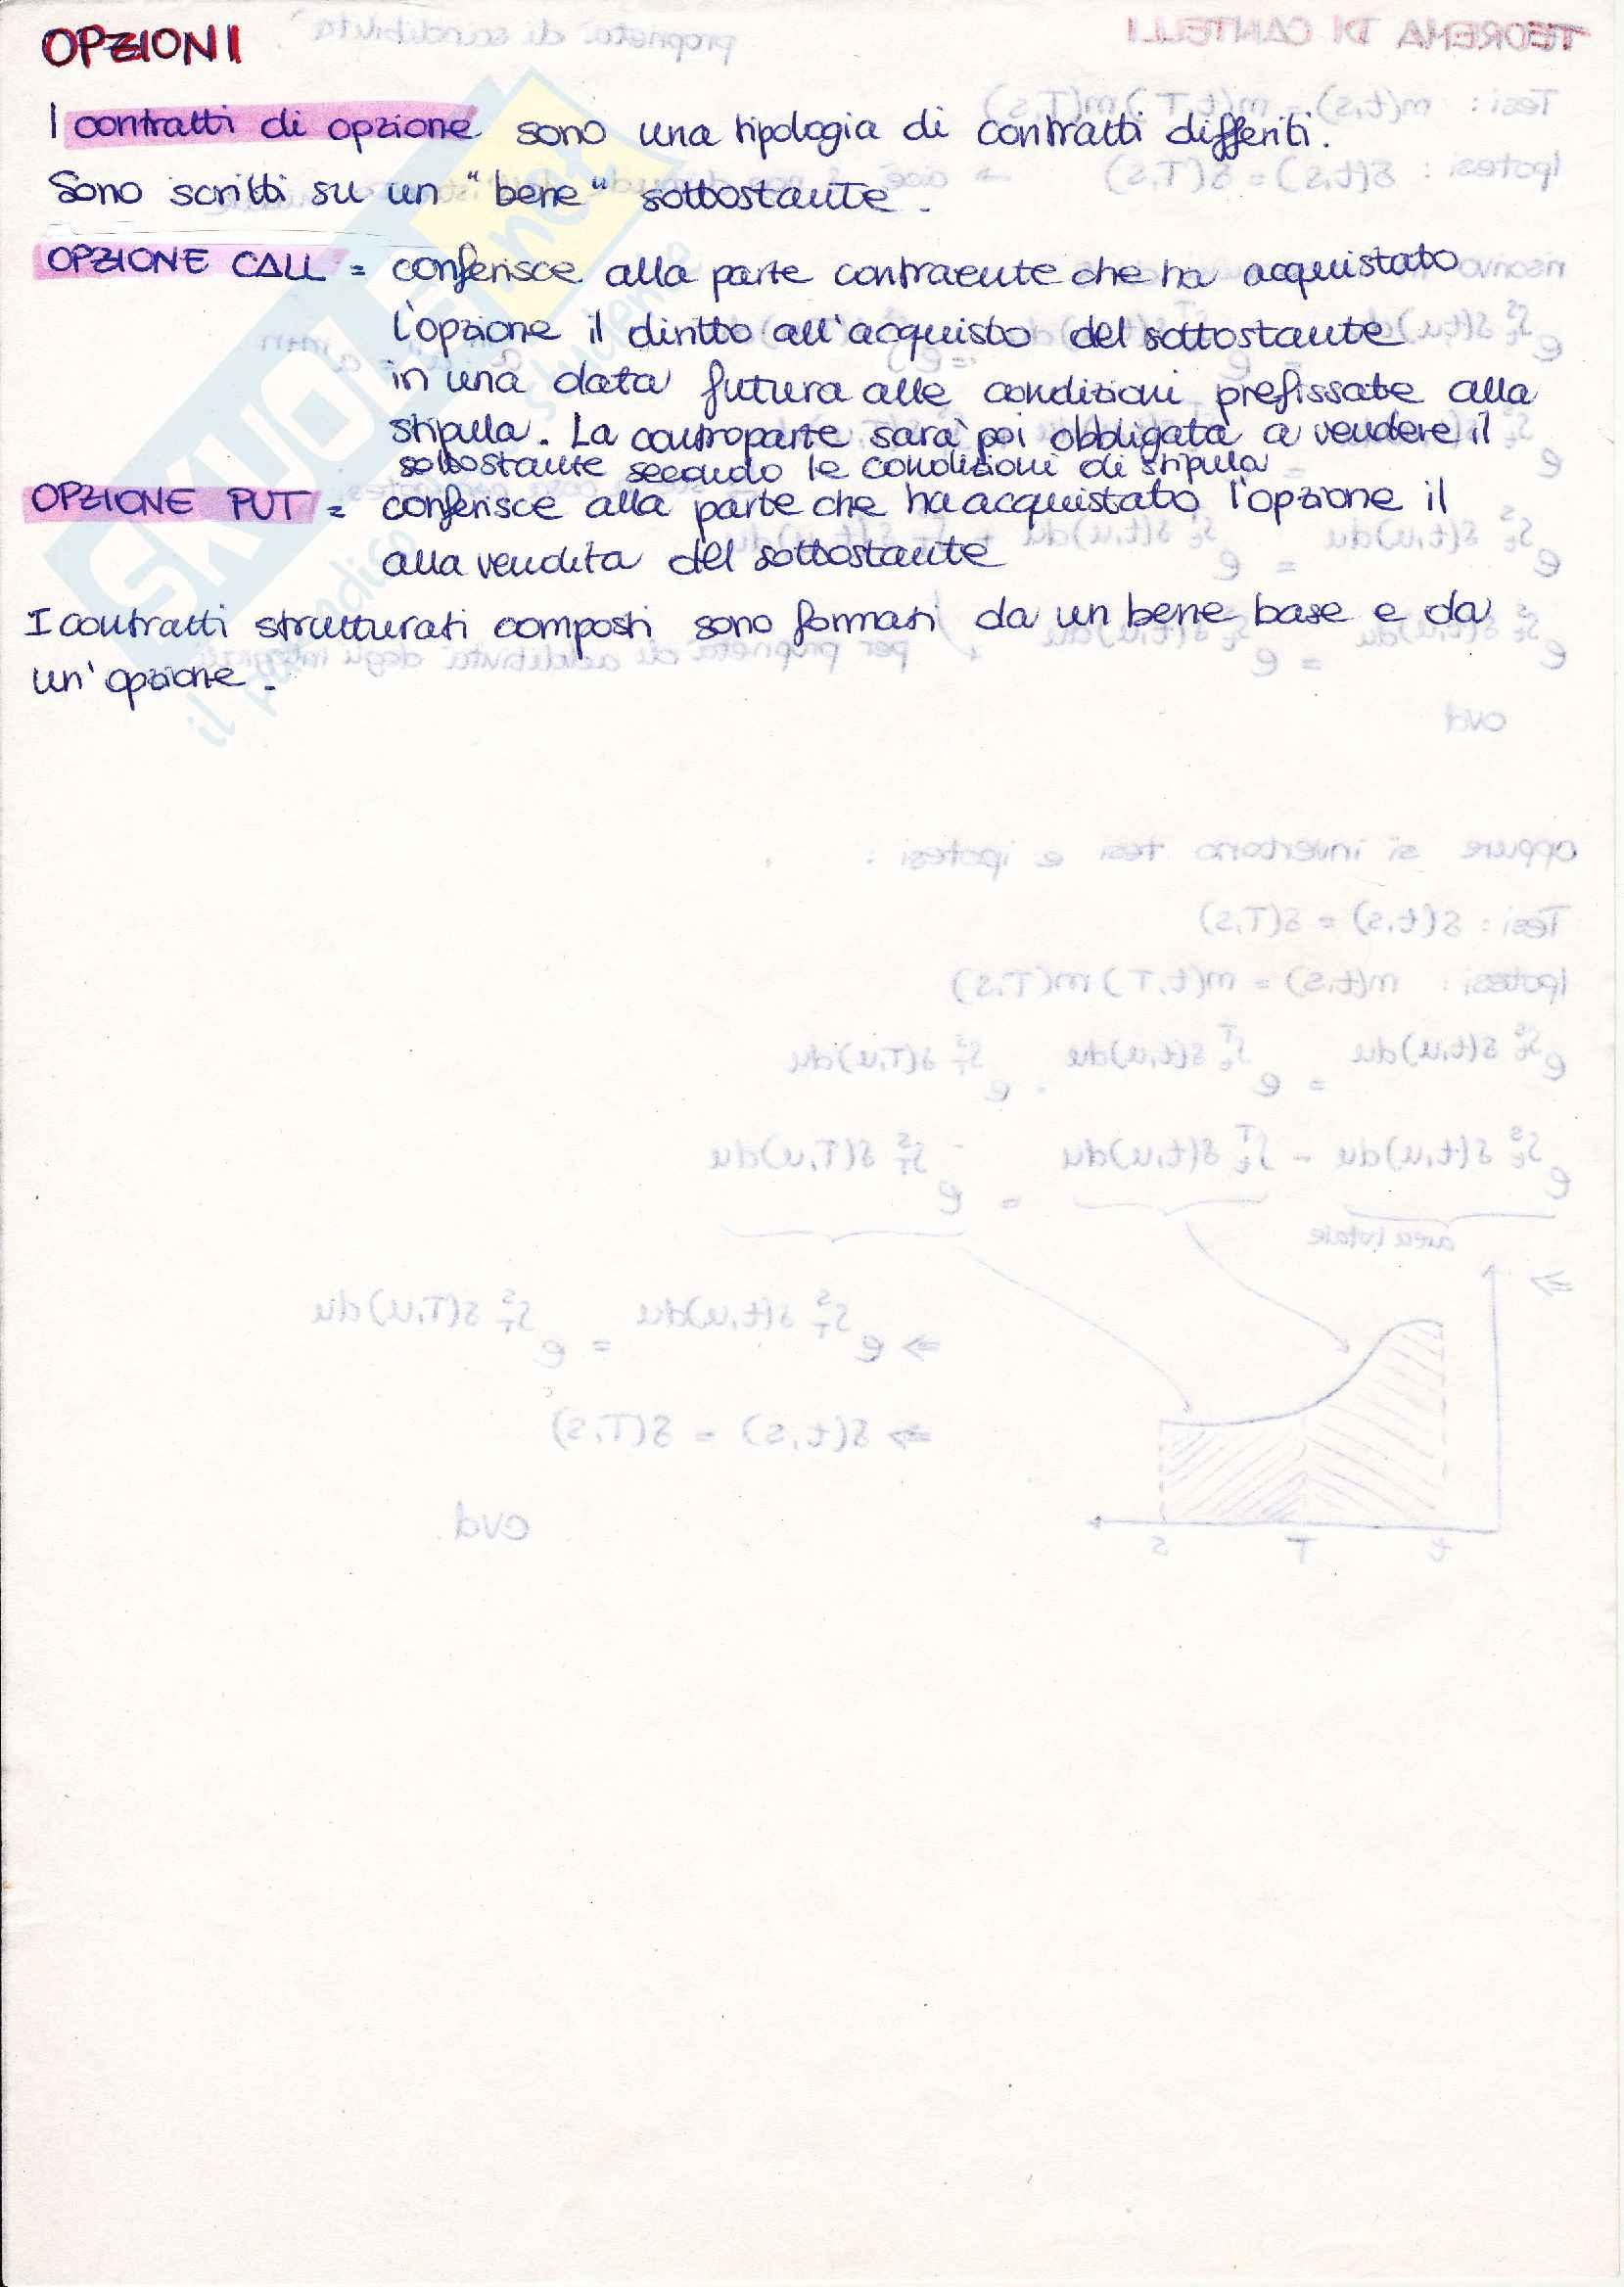 Matematica finanziaria appunti, prof. Mottura Pag. 16